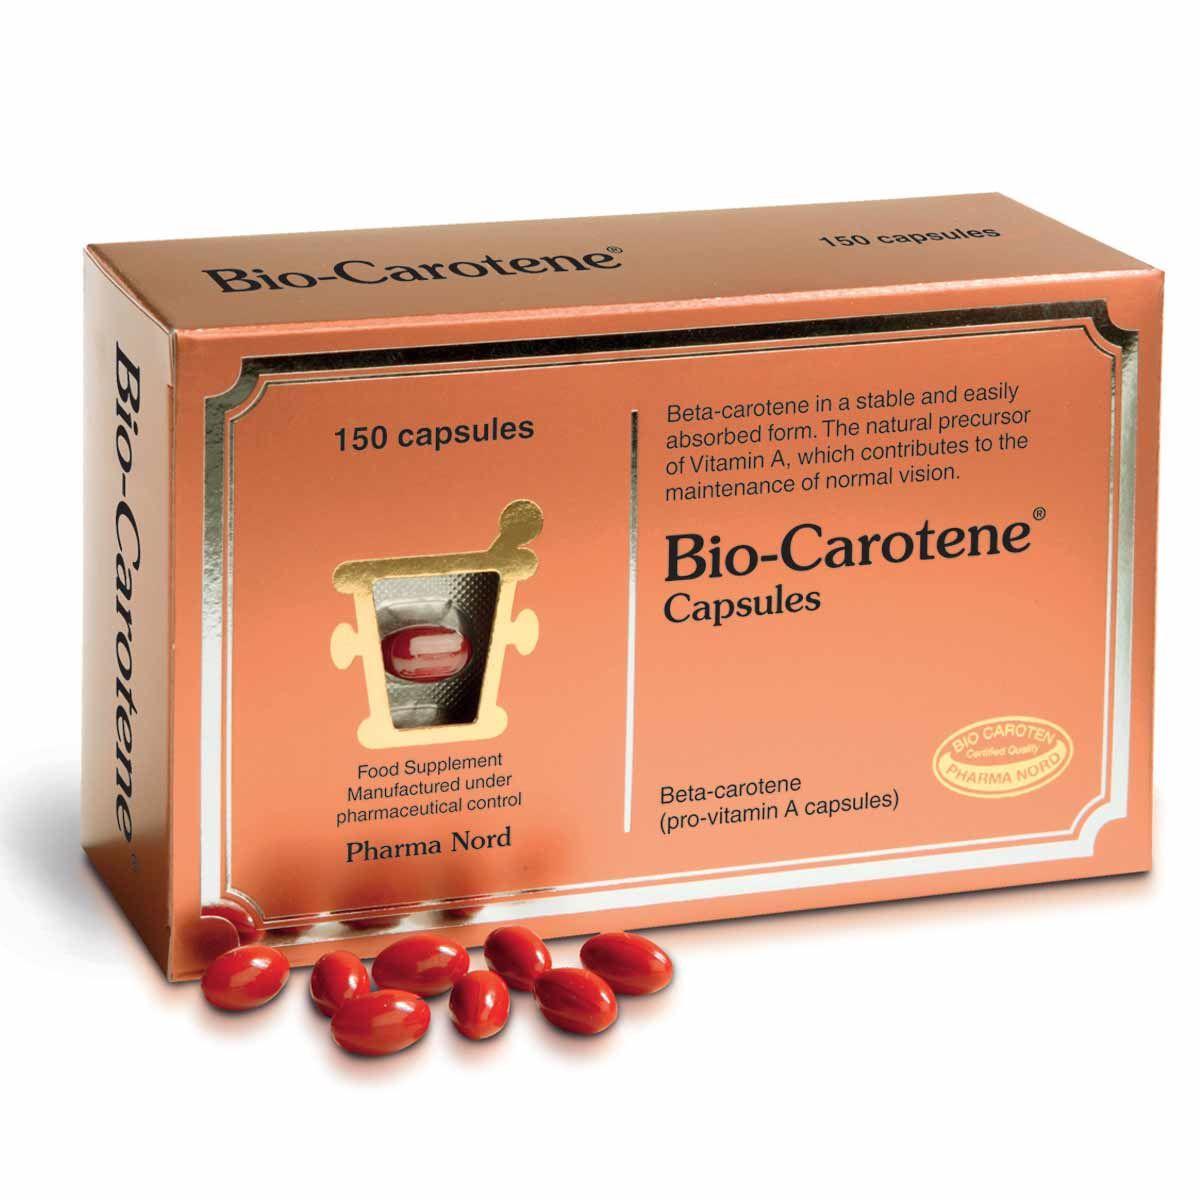 Bio-Carotene 150's